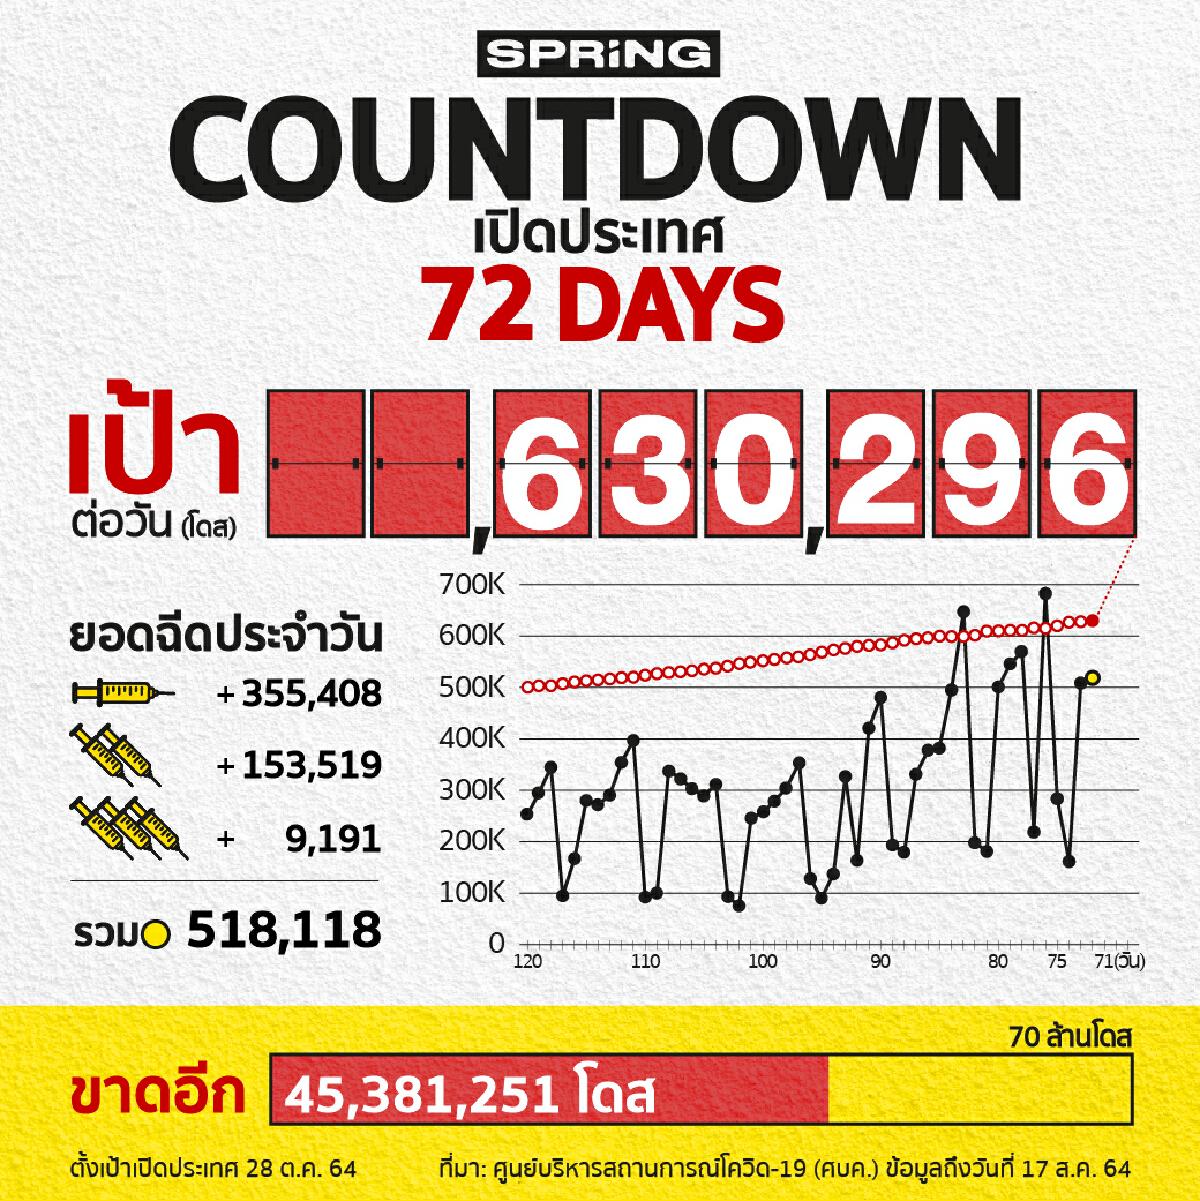 COUNTDOWN! เปิดประเทศใน 72 วัน ฉีดวัคซีนโควิด 518,118 โดส